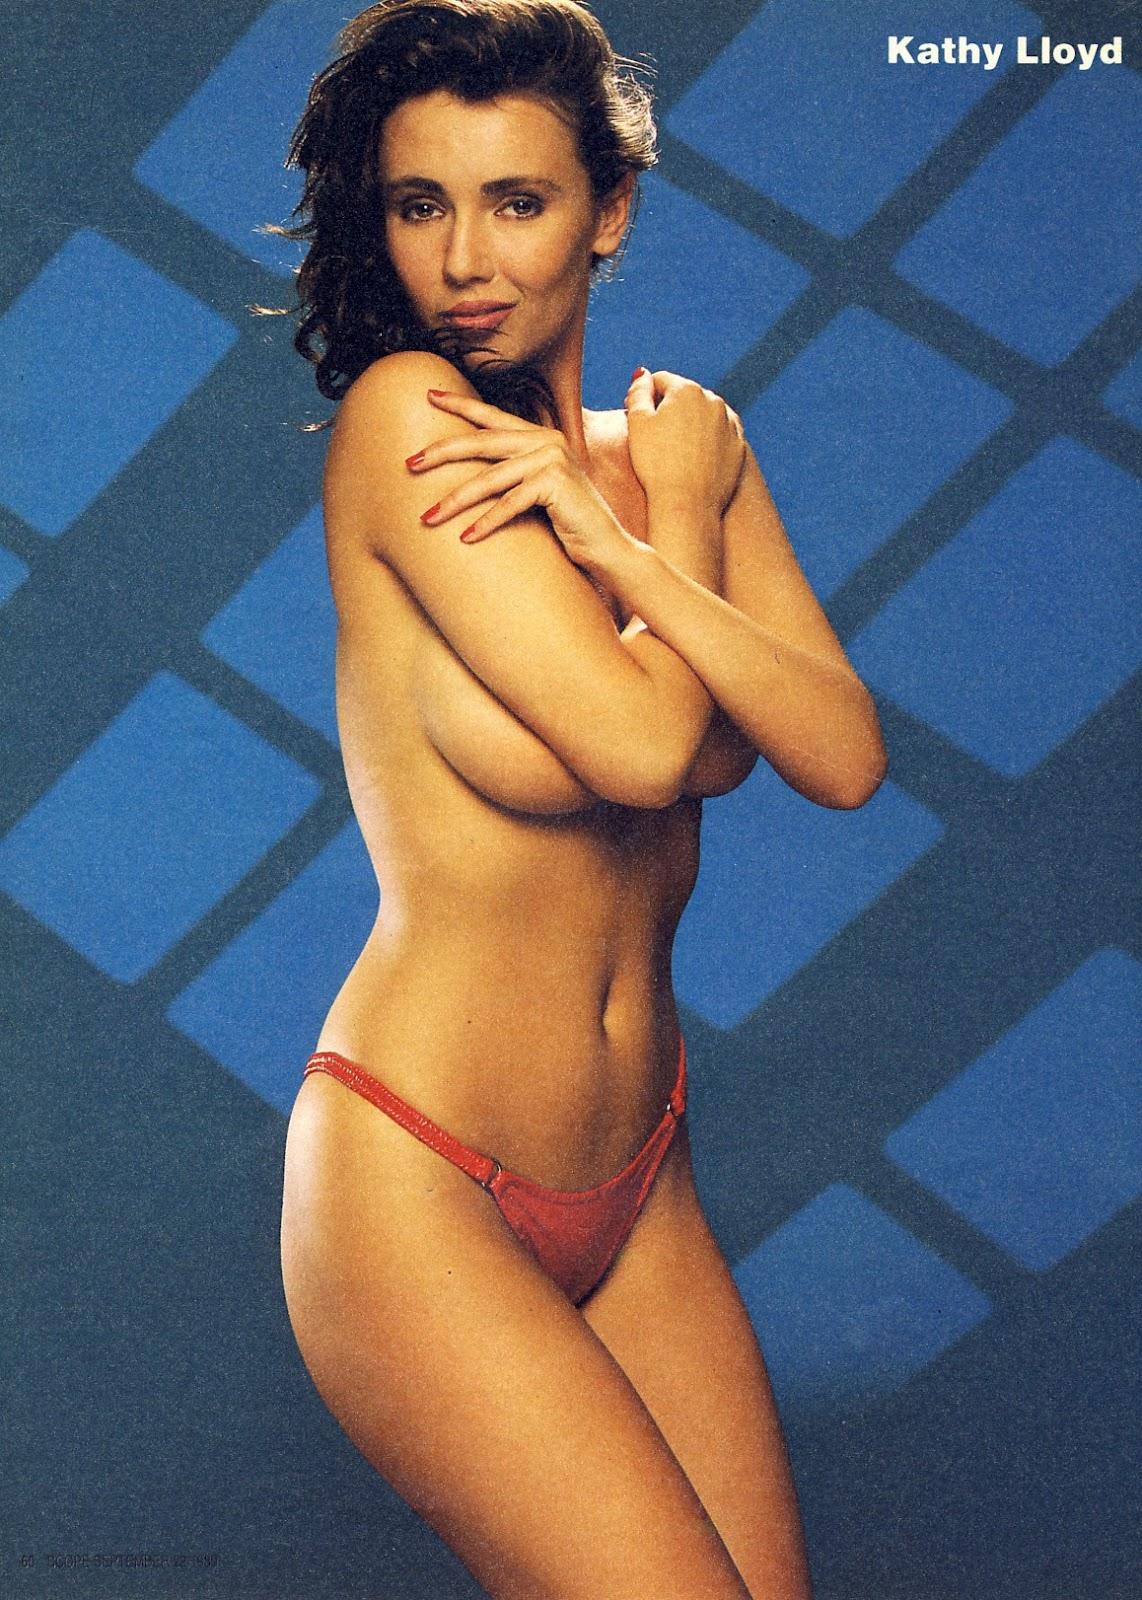 Hot women naked with guns pics